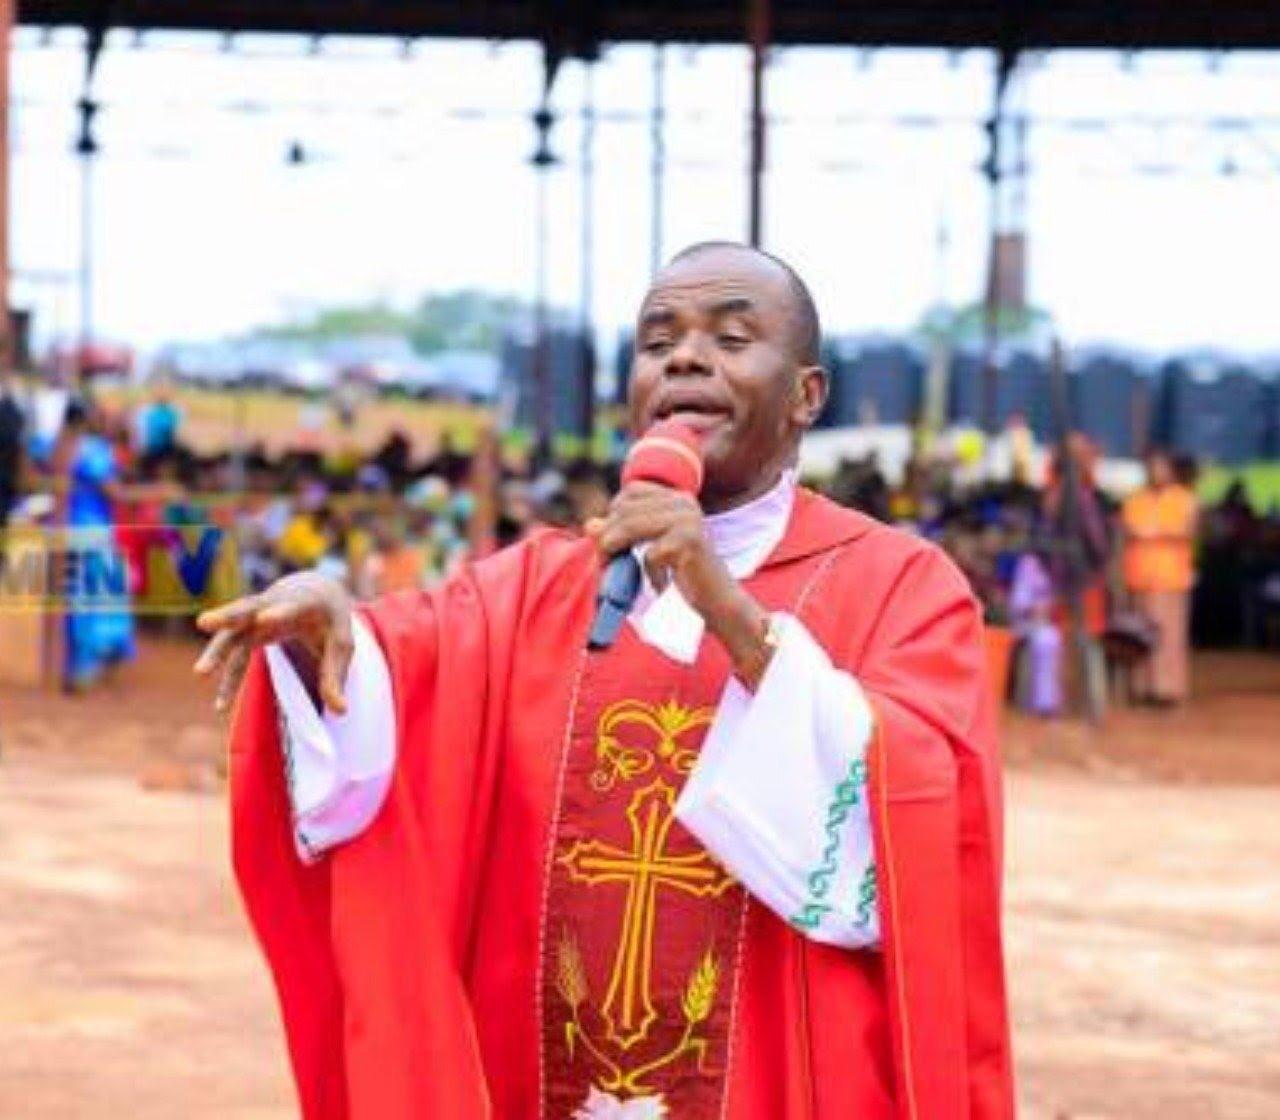 Fr Mbaka ordination and career